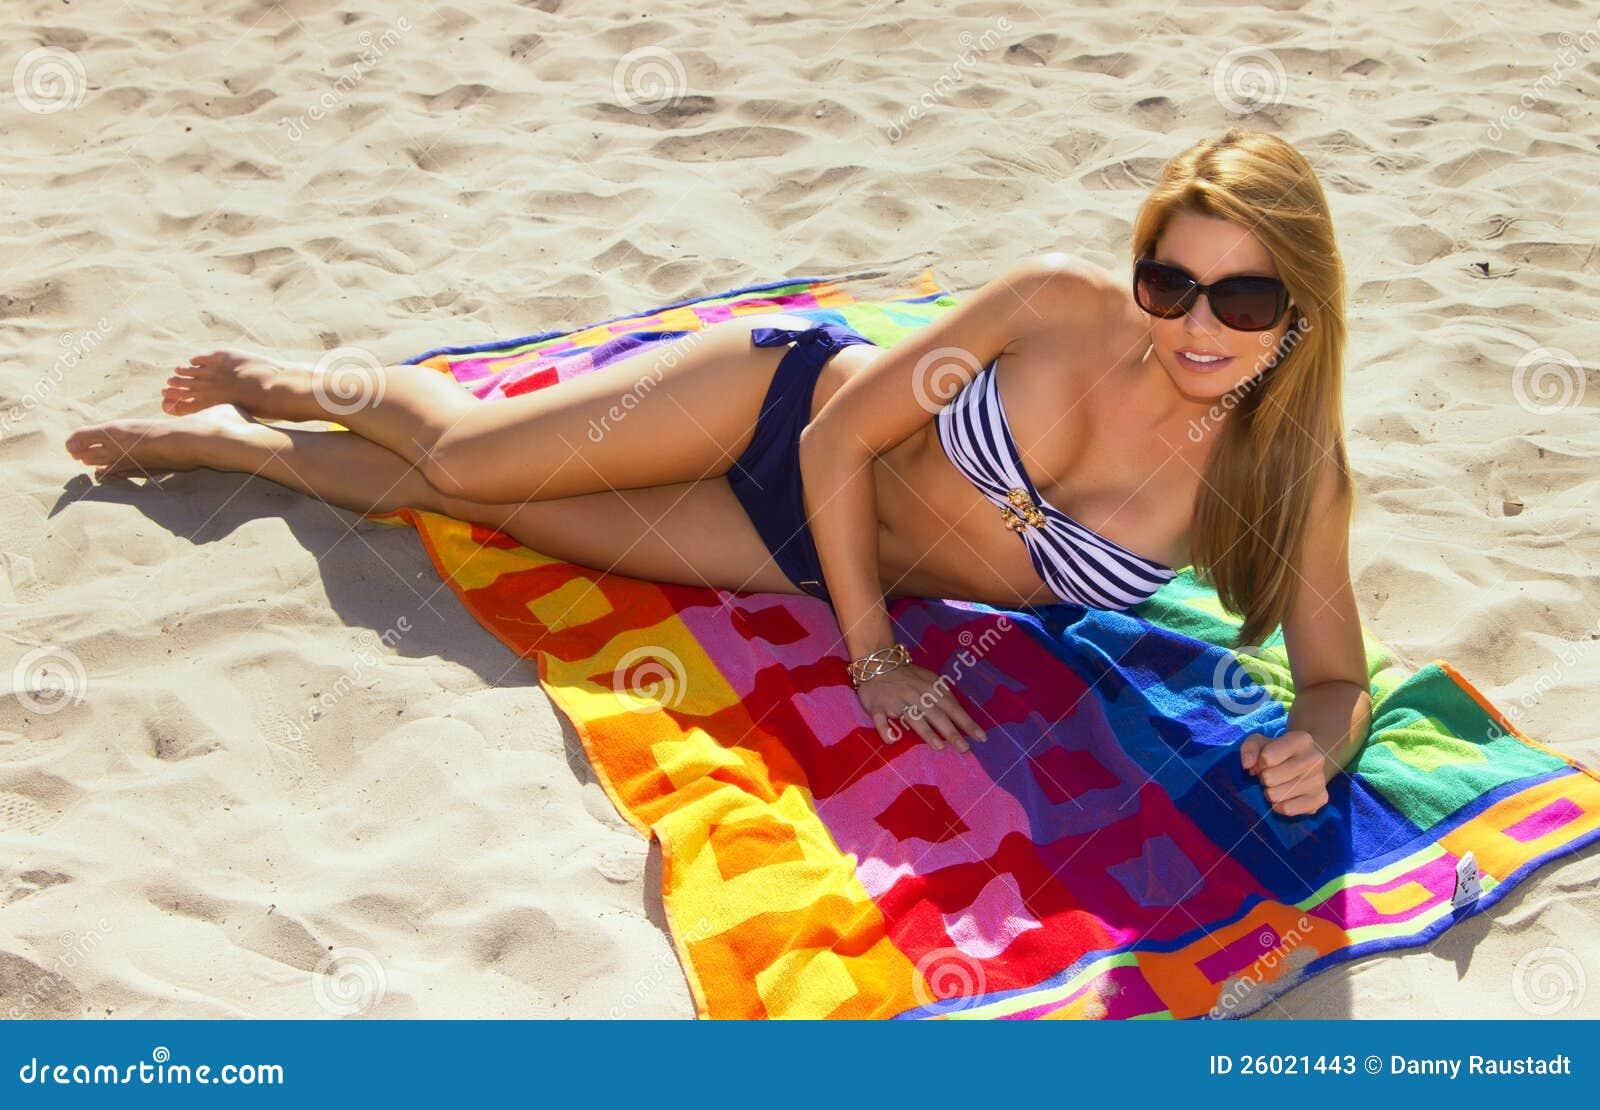 Mujer rubia linda joven vacationing en la playa